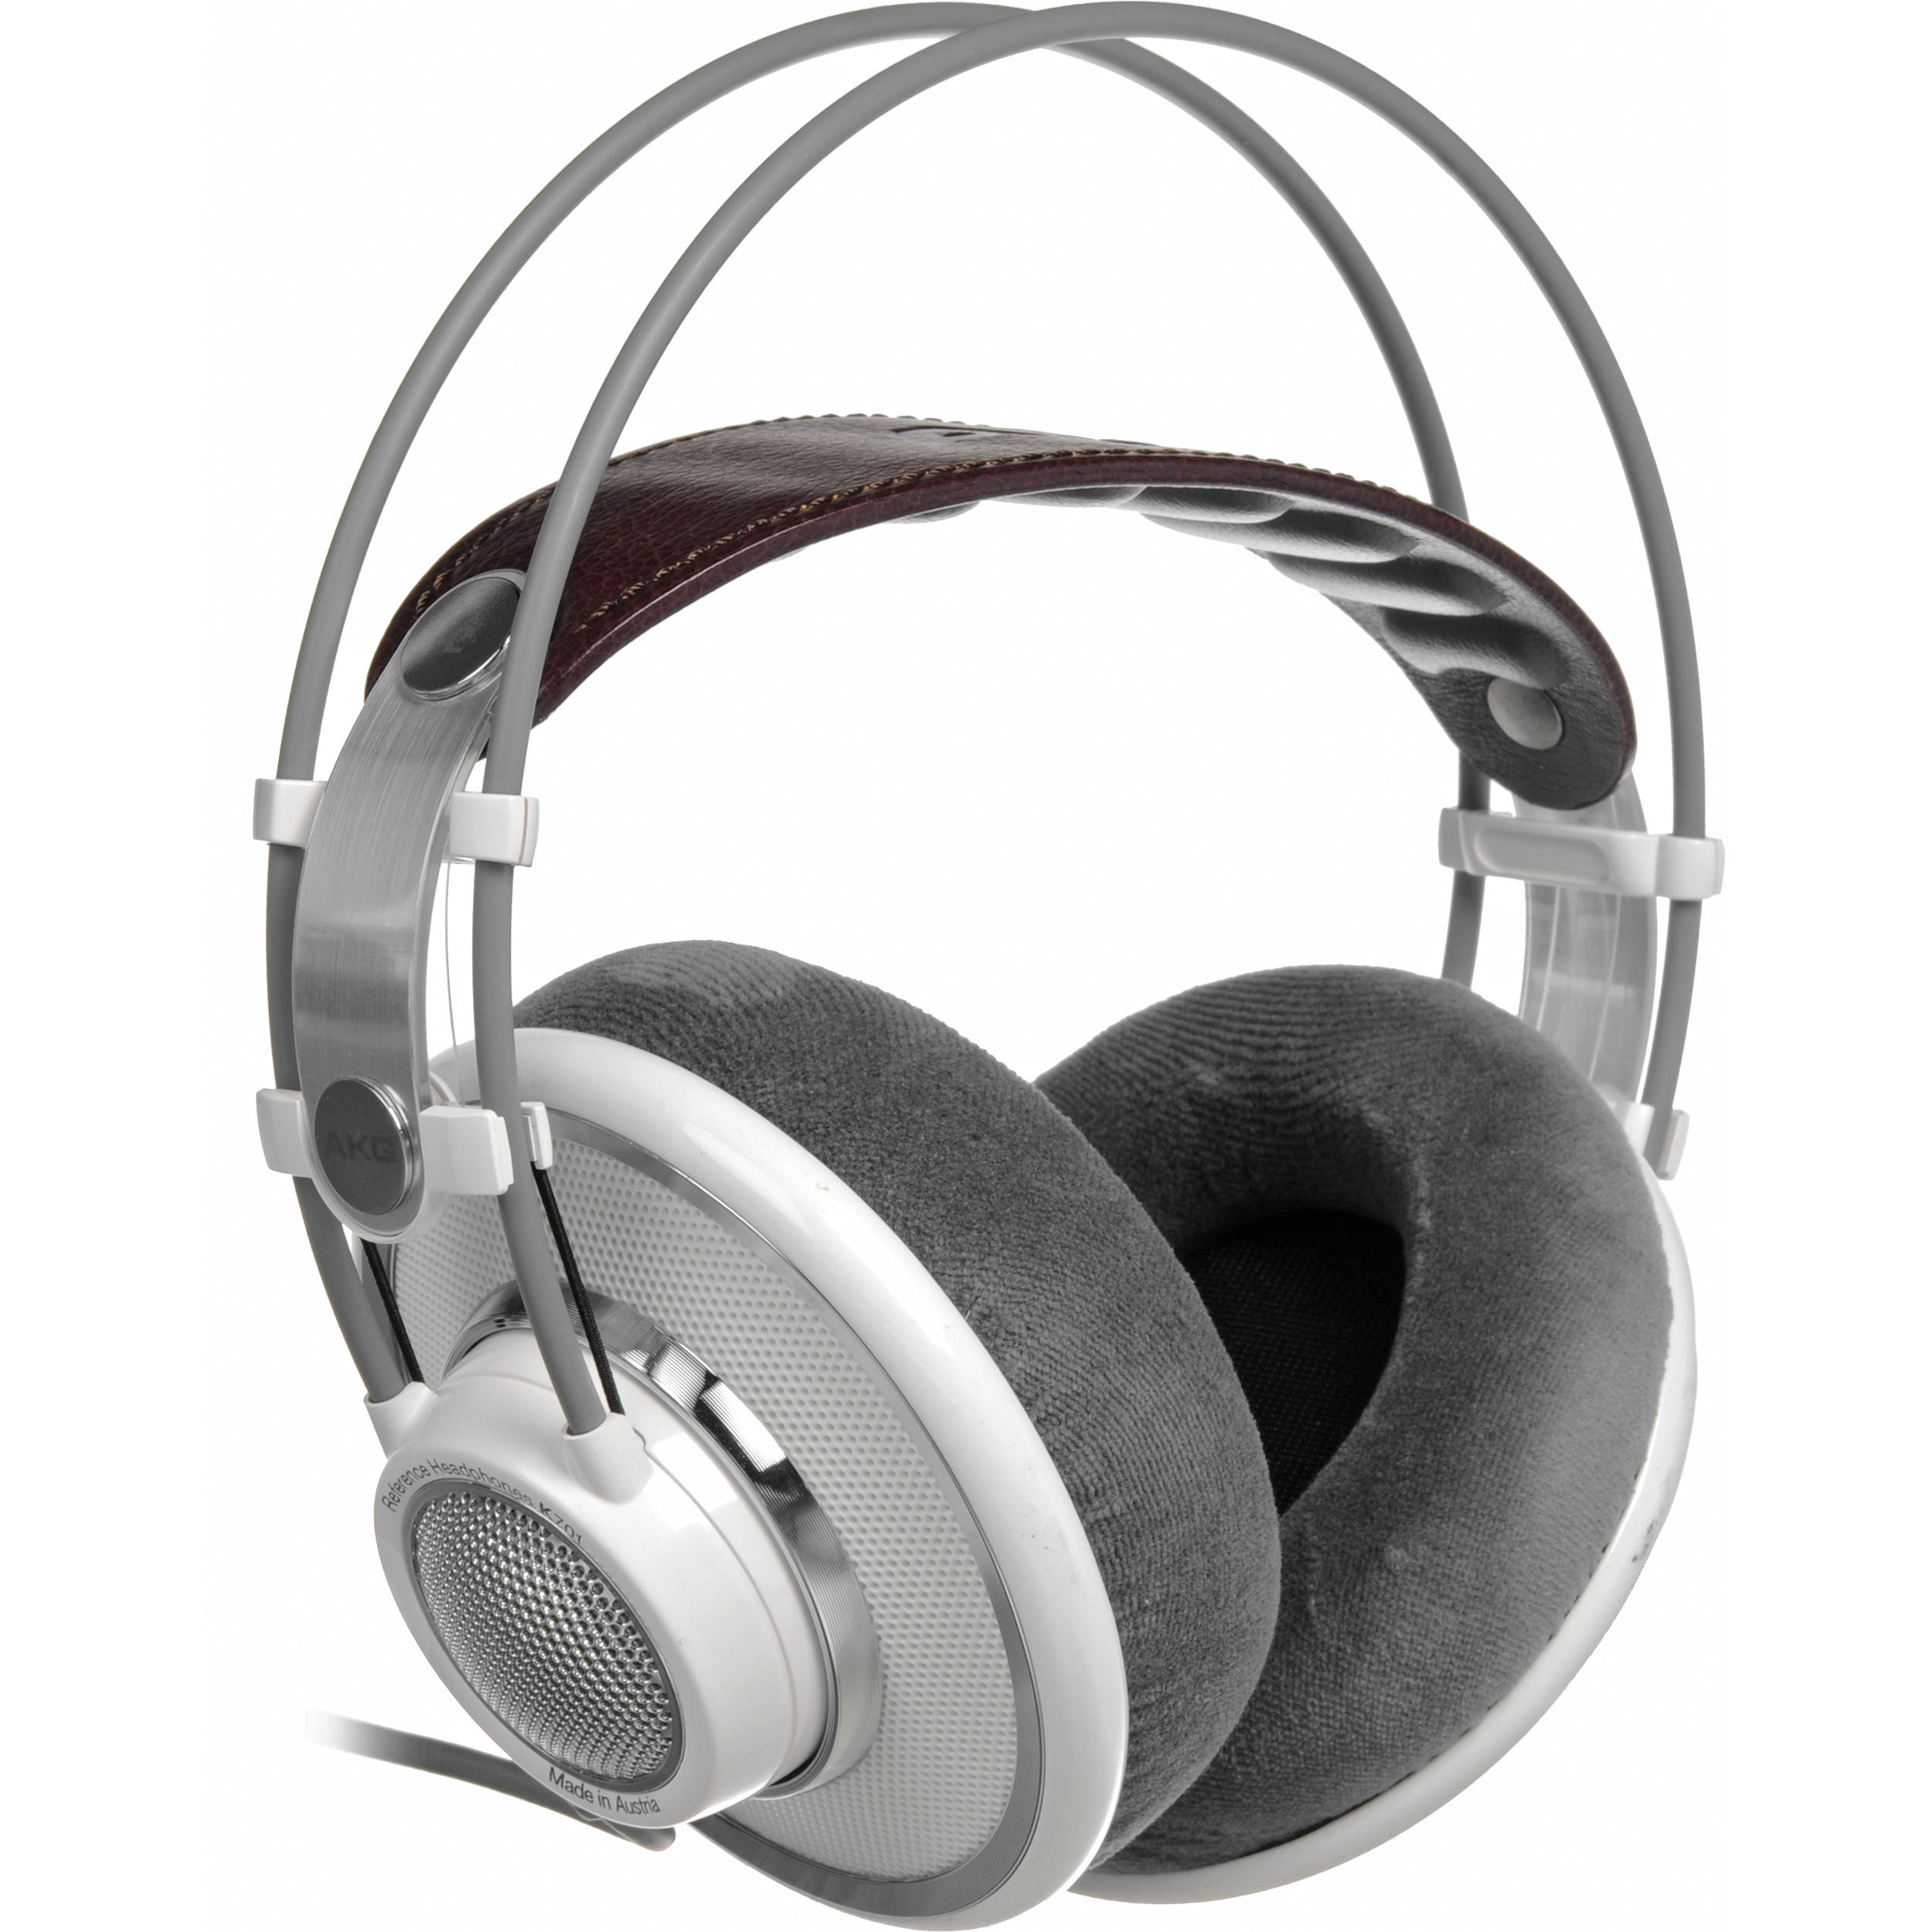 c663a3ff72b AKG K701 Reference Headphones 2458X00180 B&H Photo Video